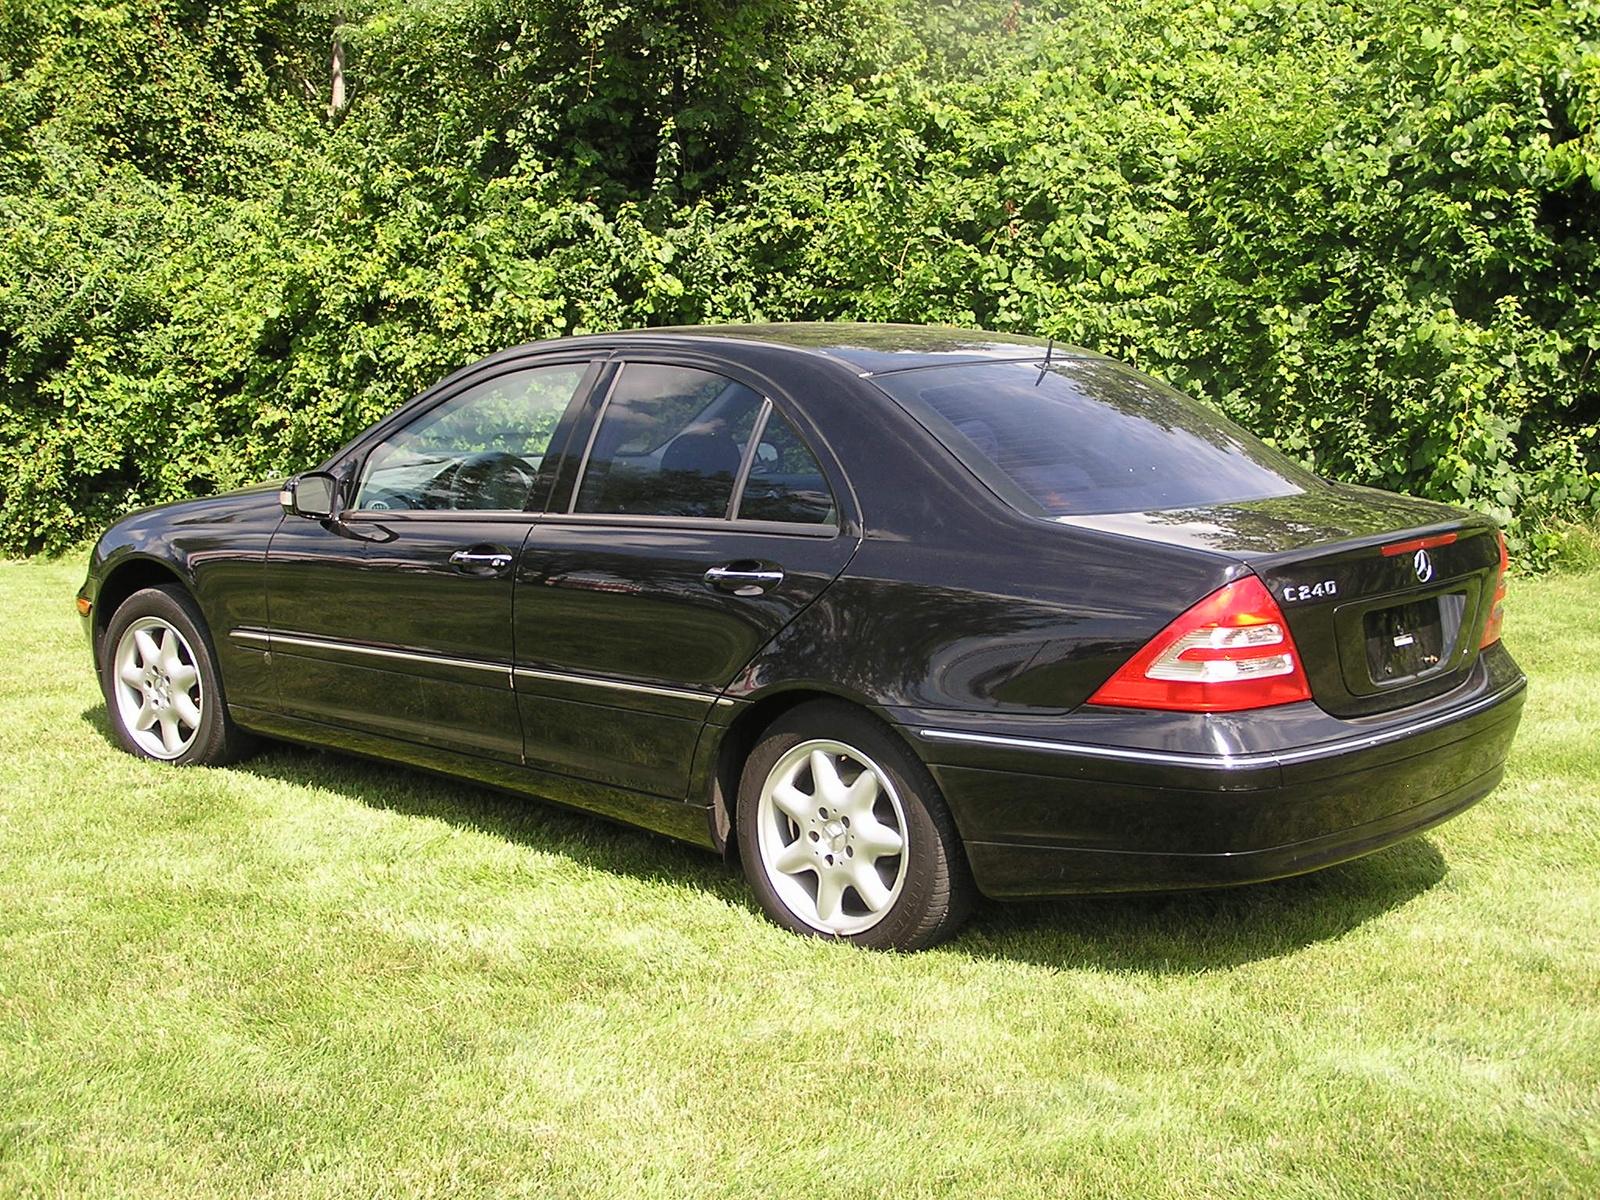 2002 mercedes benz c class pictures cargurus for 2002 mercedes benz c class sedan